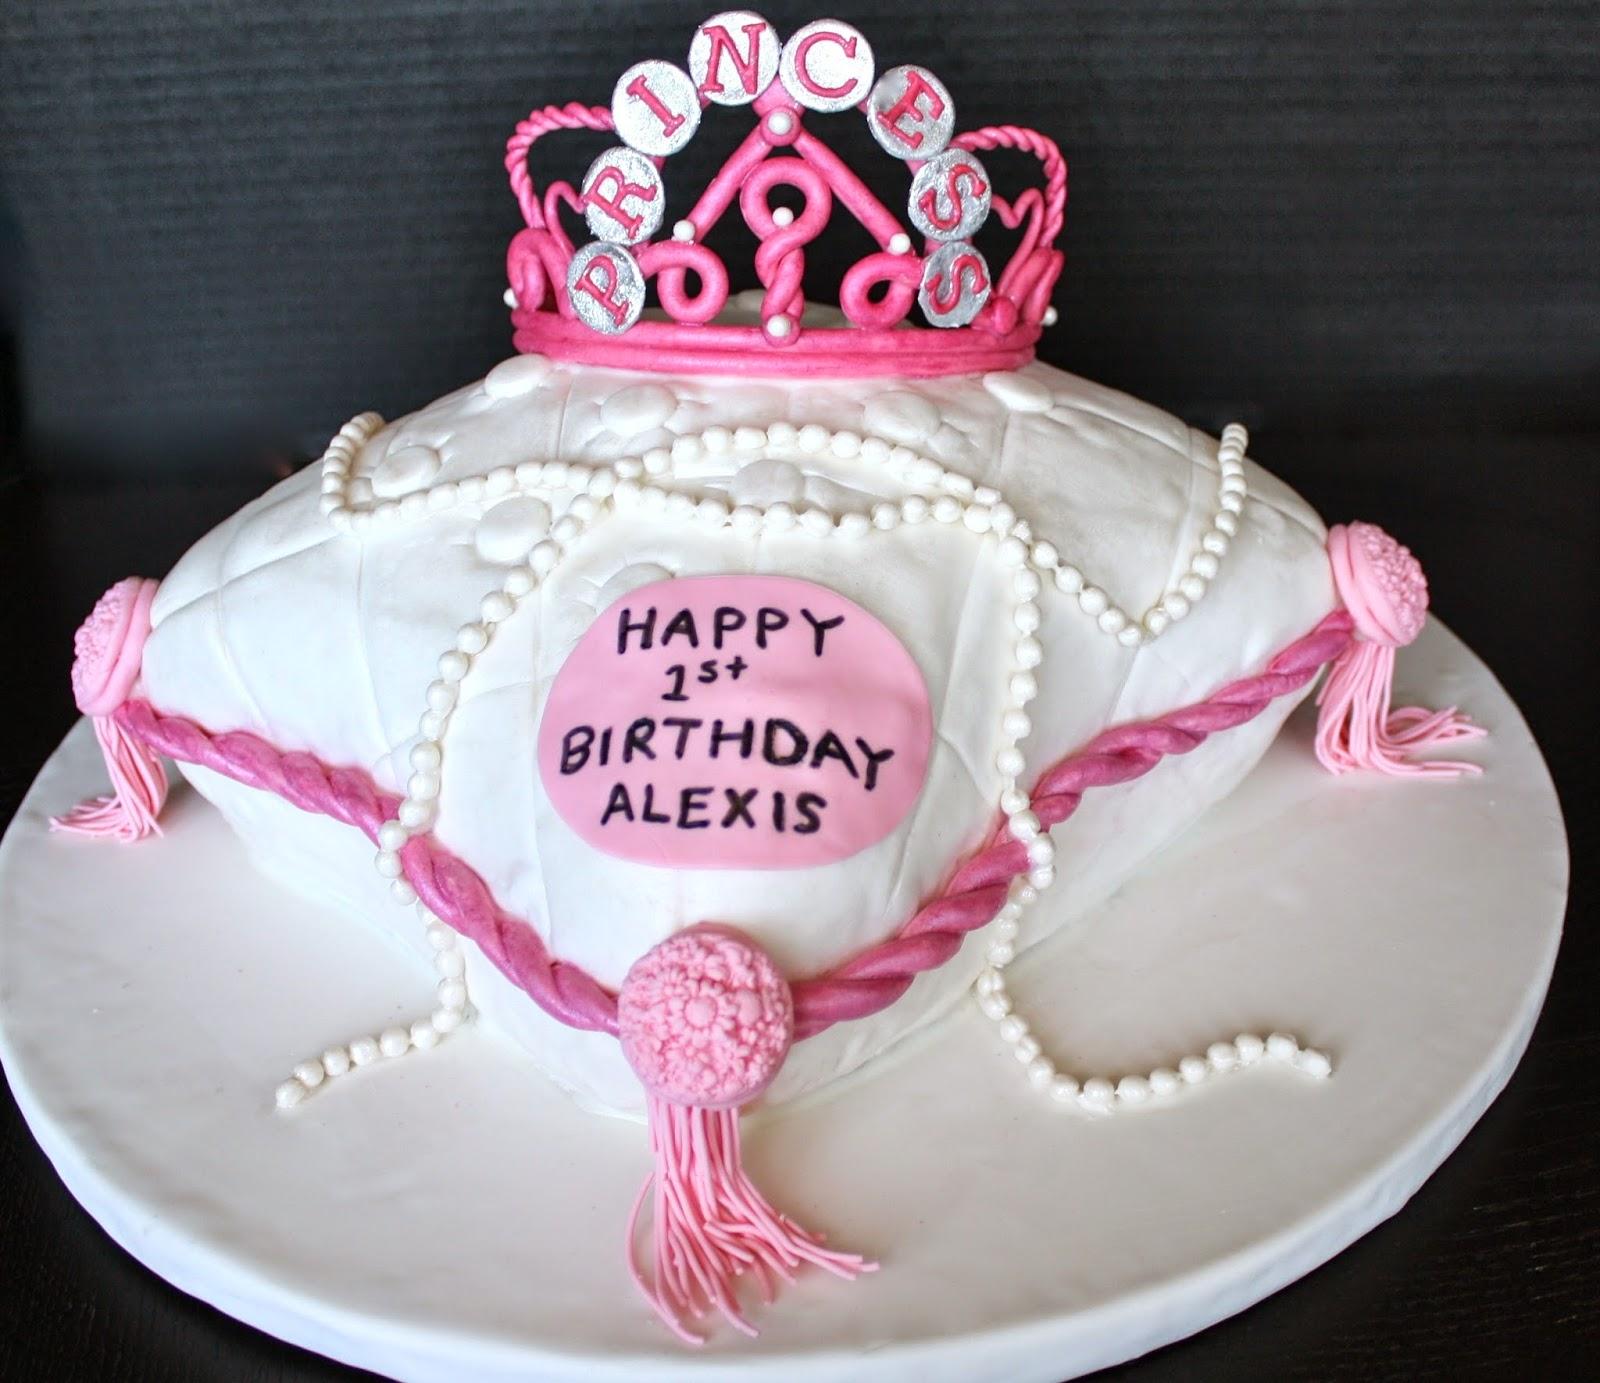 Happy Birthday Gina Cake Images